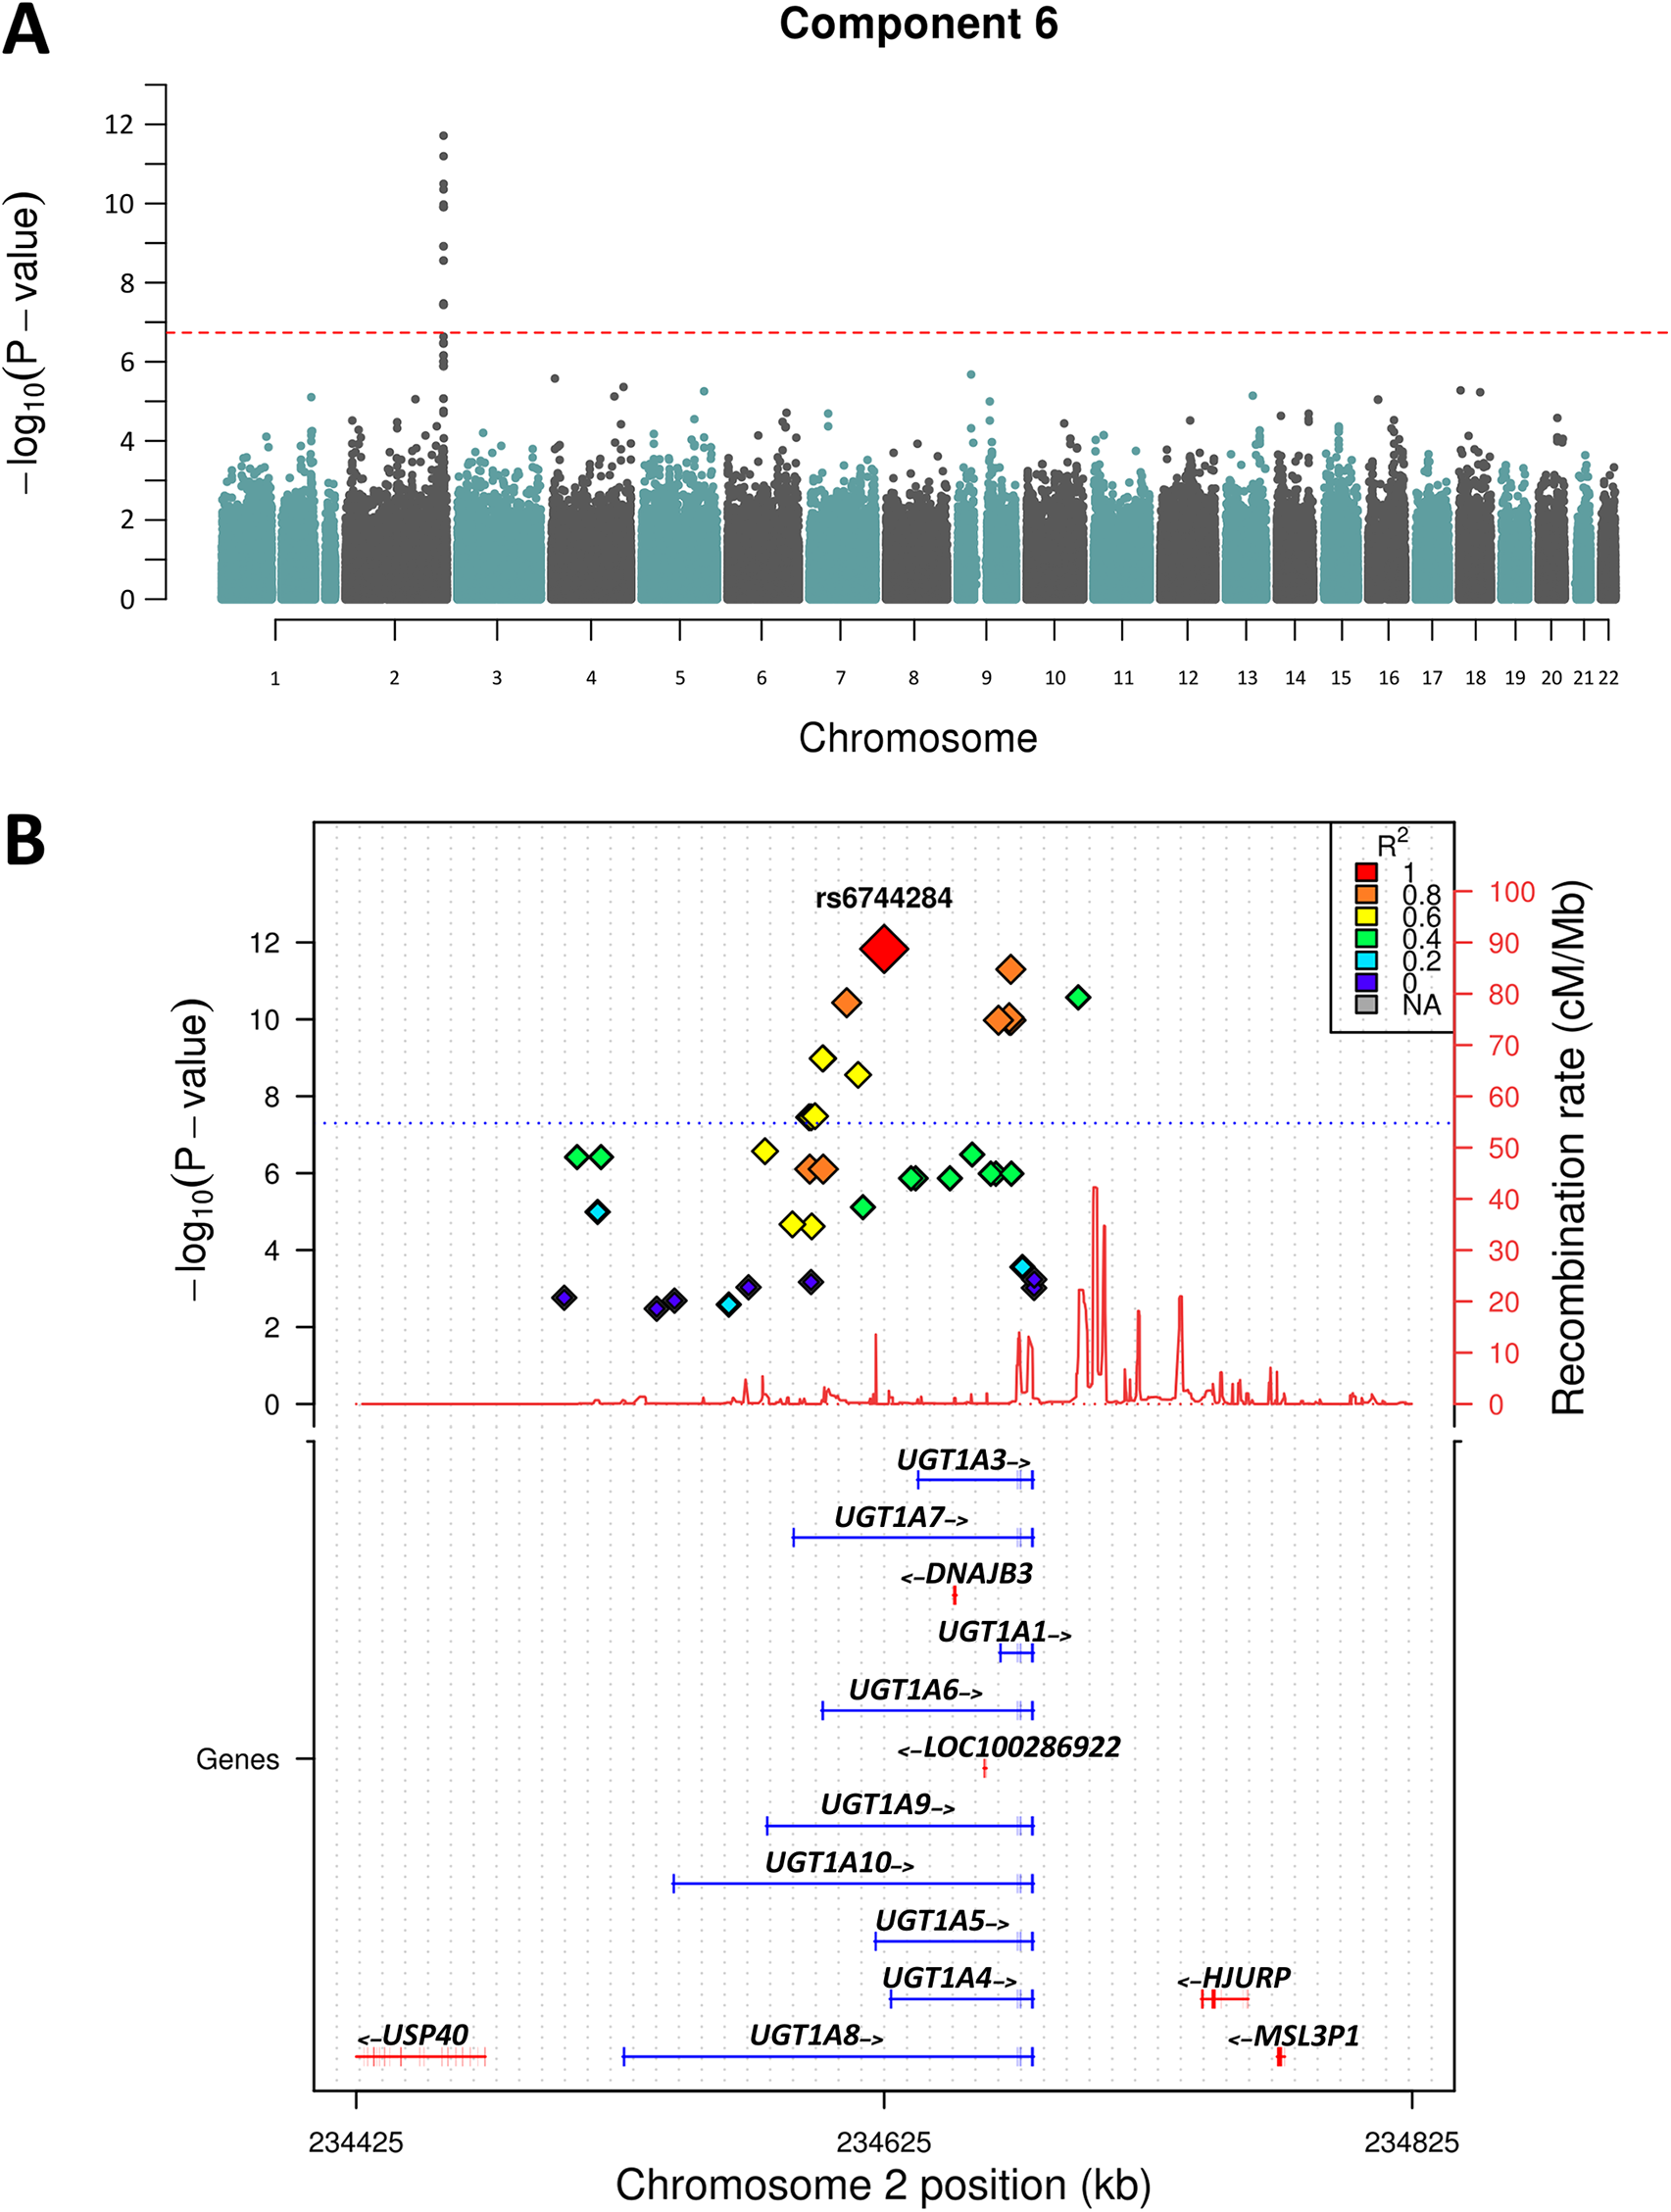 Manhattan plot of Chromosome 2 showing Component 6 associations.